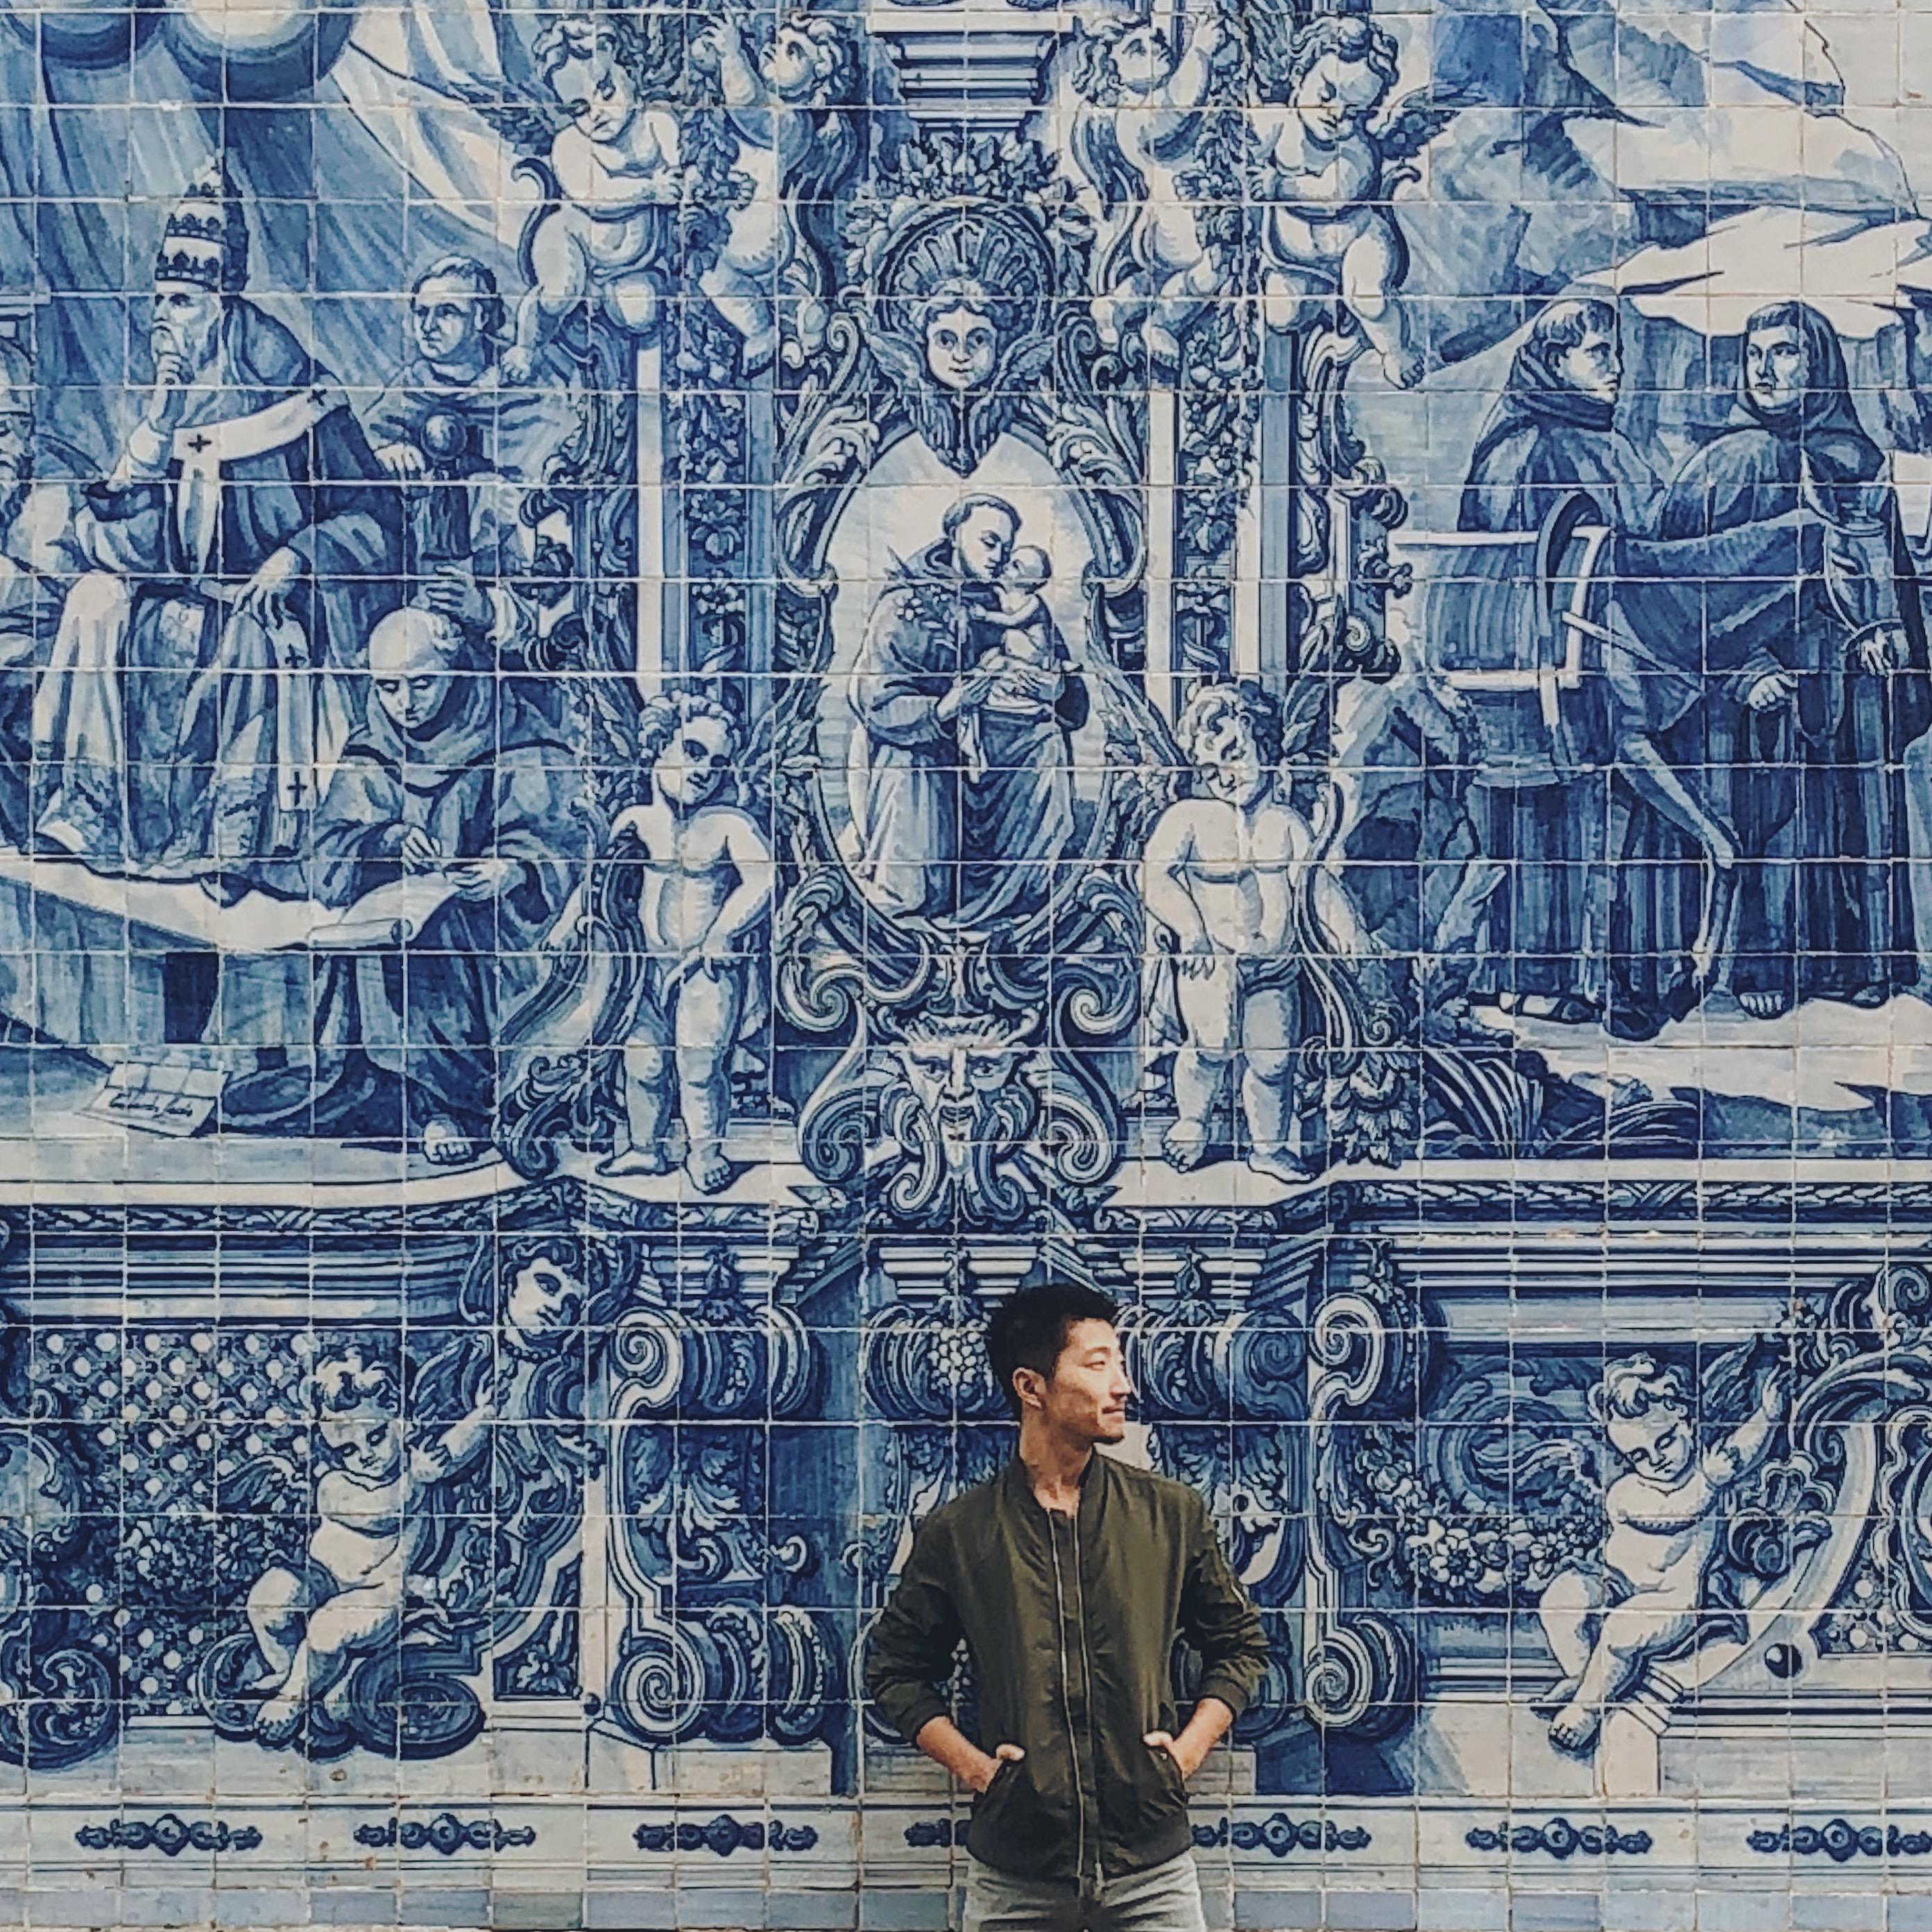 Man standing in front of blue tin-glazed ceramic tiled façade